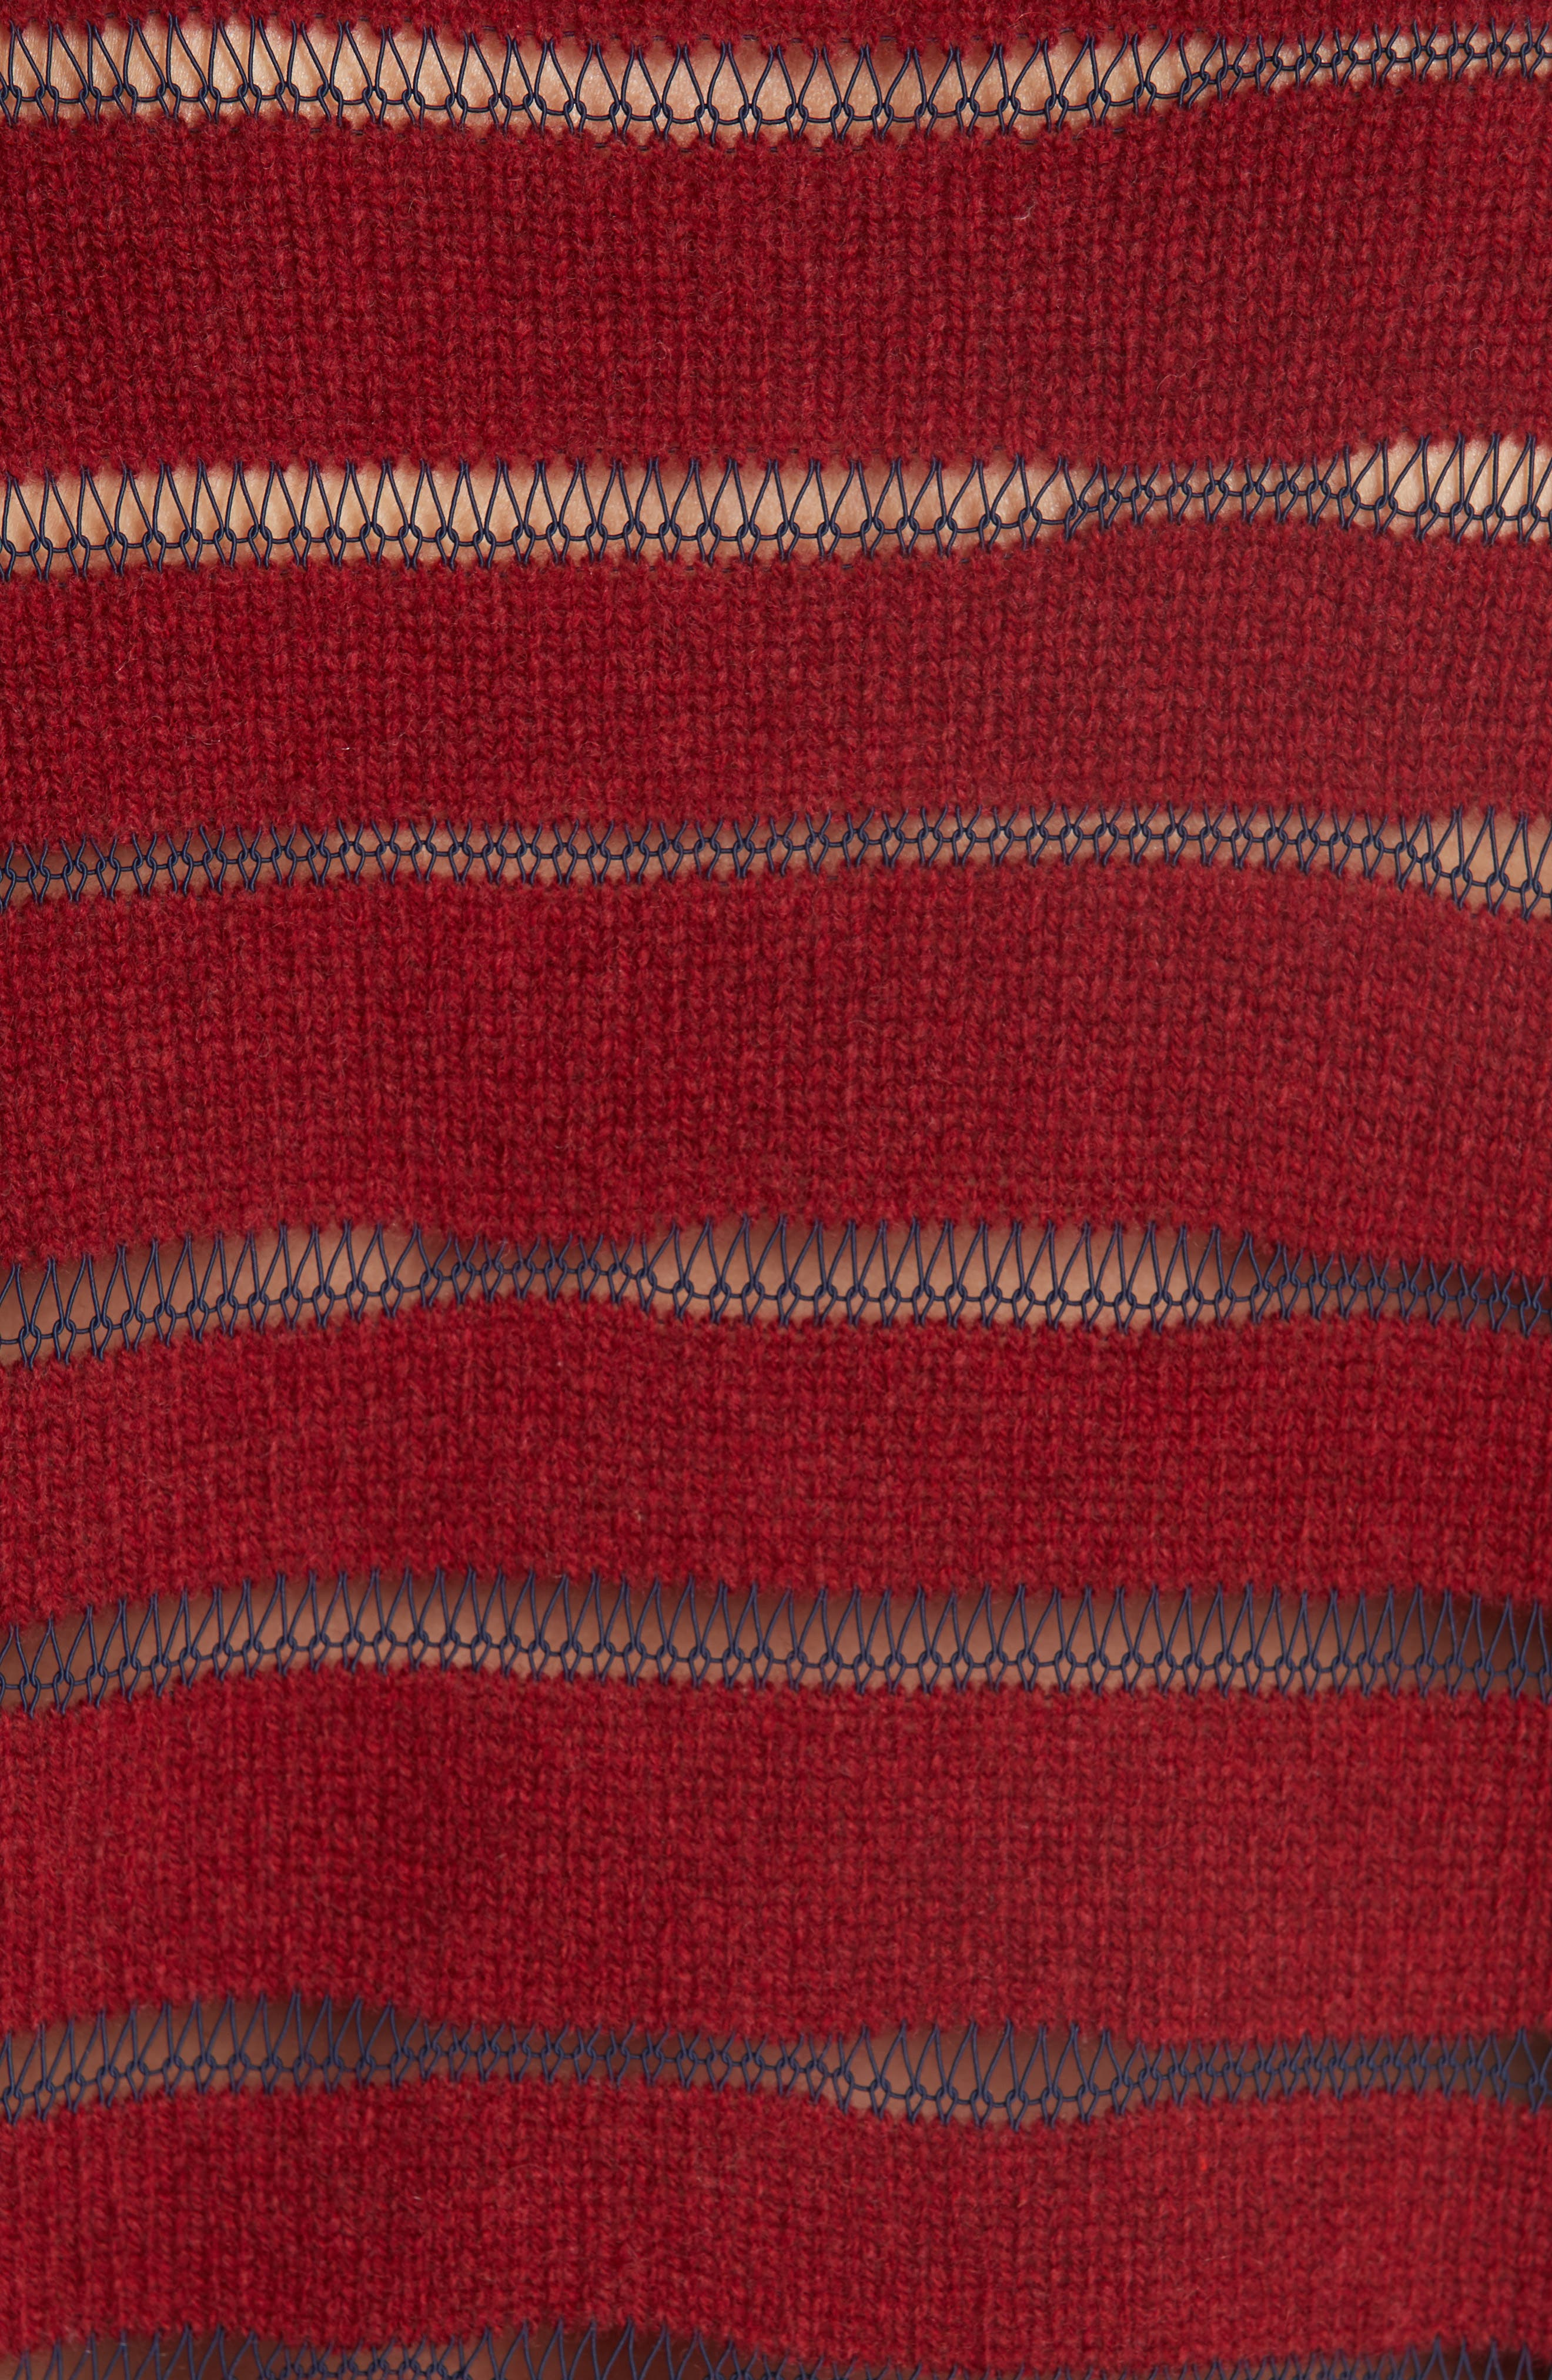 Penn Sheer Stripe Crop Sweater,                             Alternate thumbnail 5, color,                             068